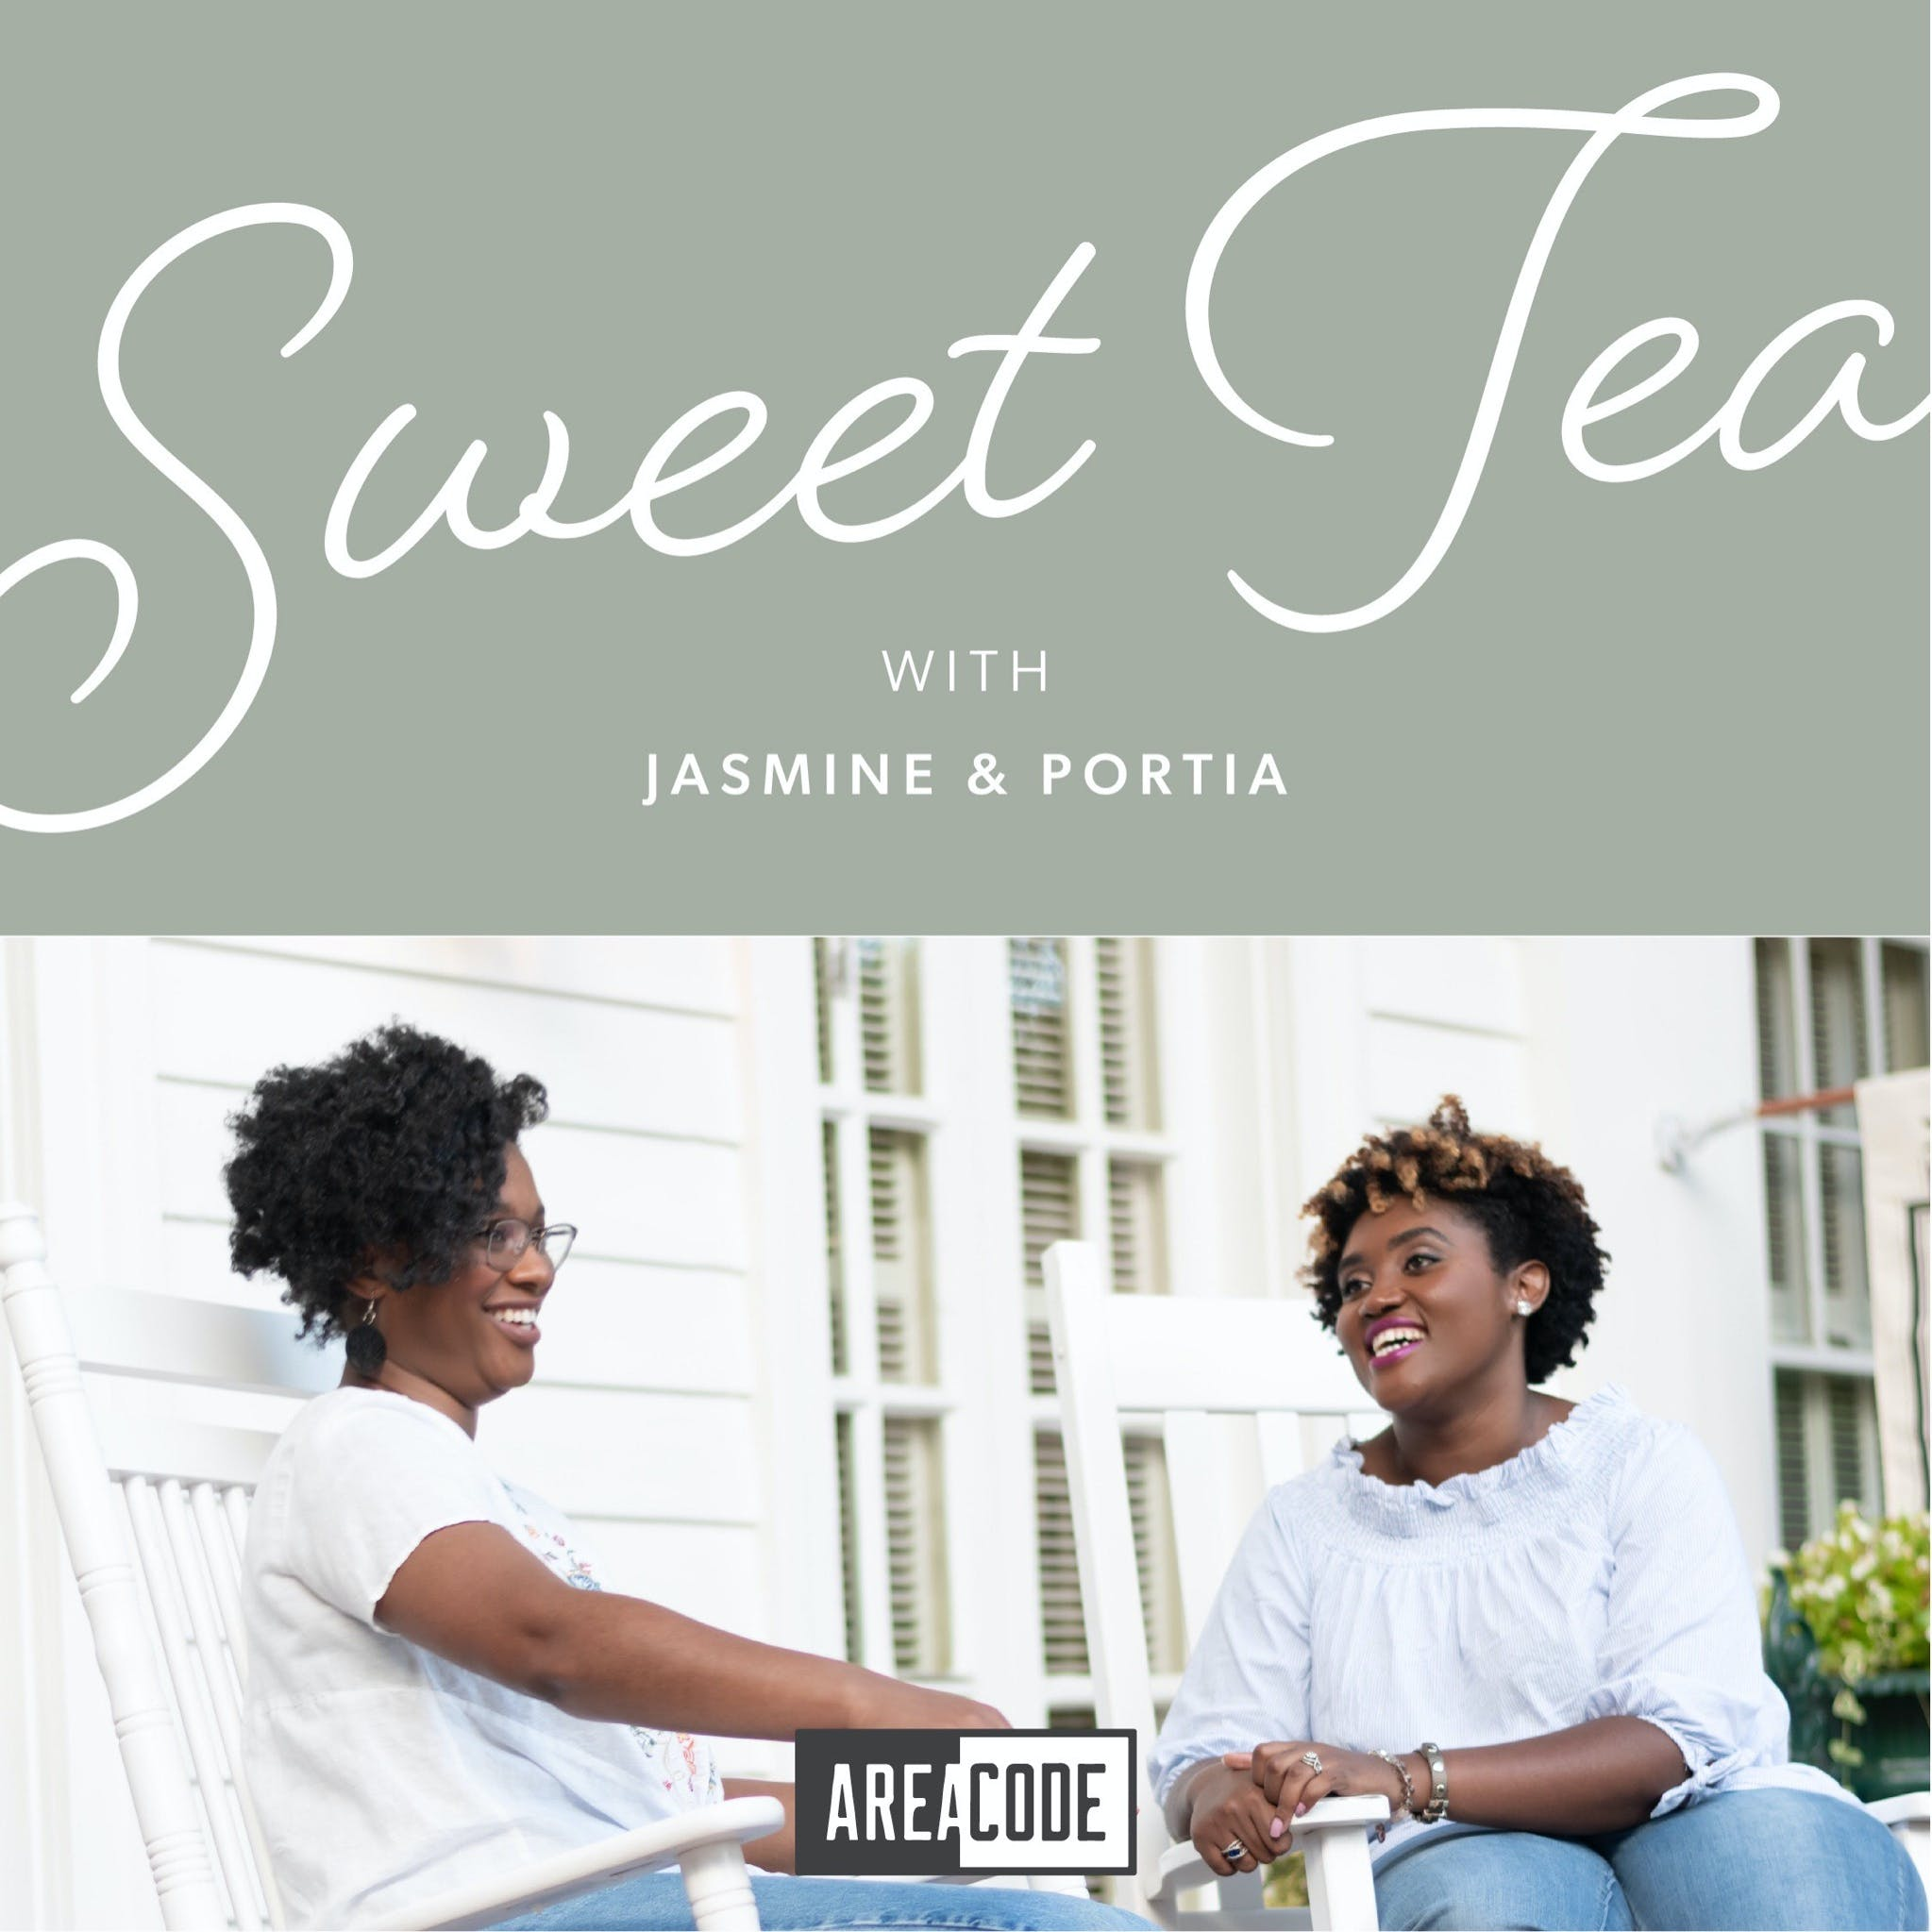 Sweet Tea with Jasmine and Portia